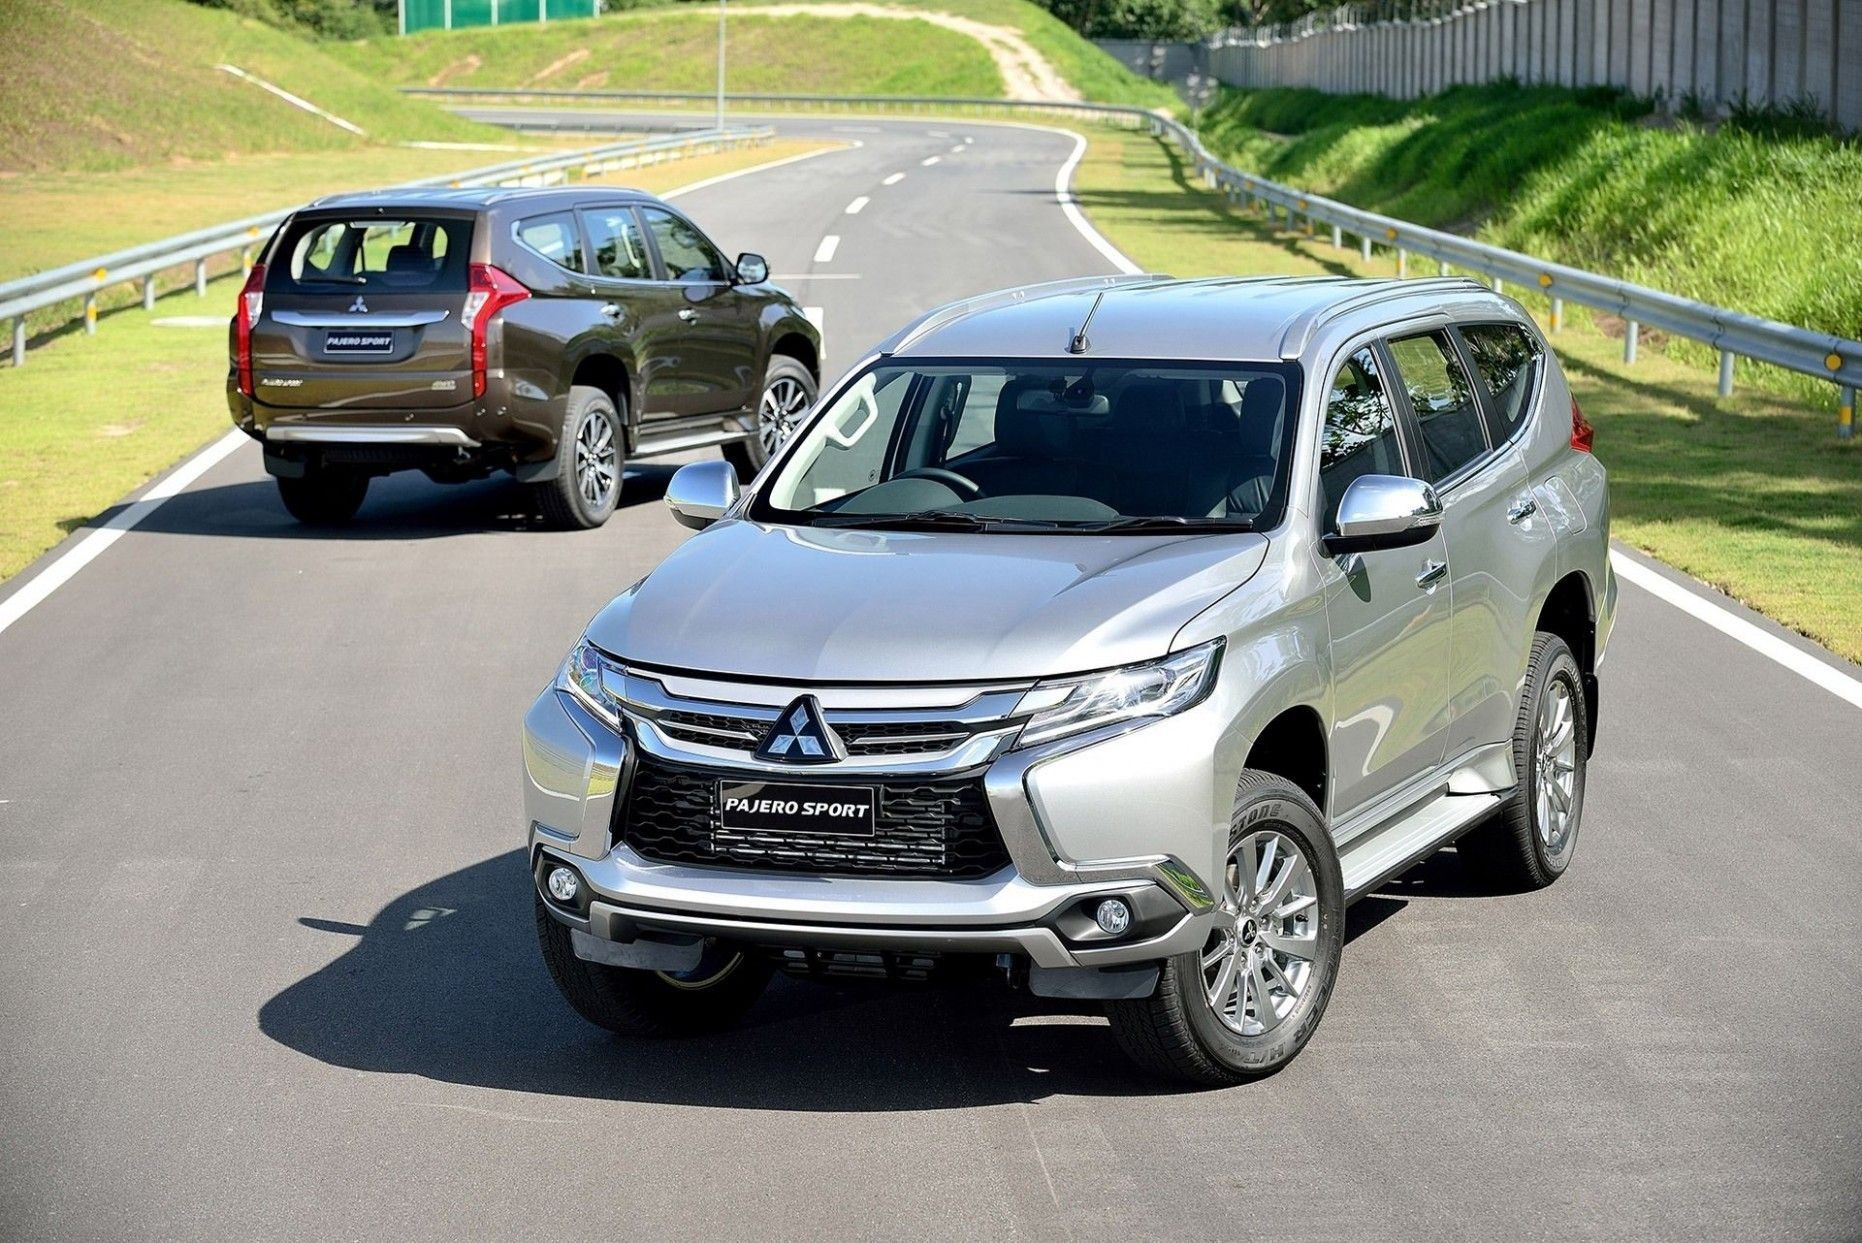 2021 Mitsubishi Montero Sport Philippines Image En 2020 Montero Sport Mitsubishi Pajero Fotos